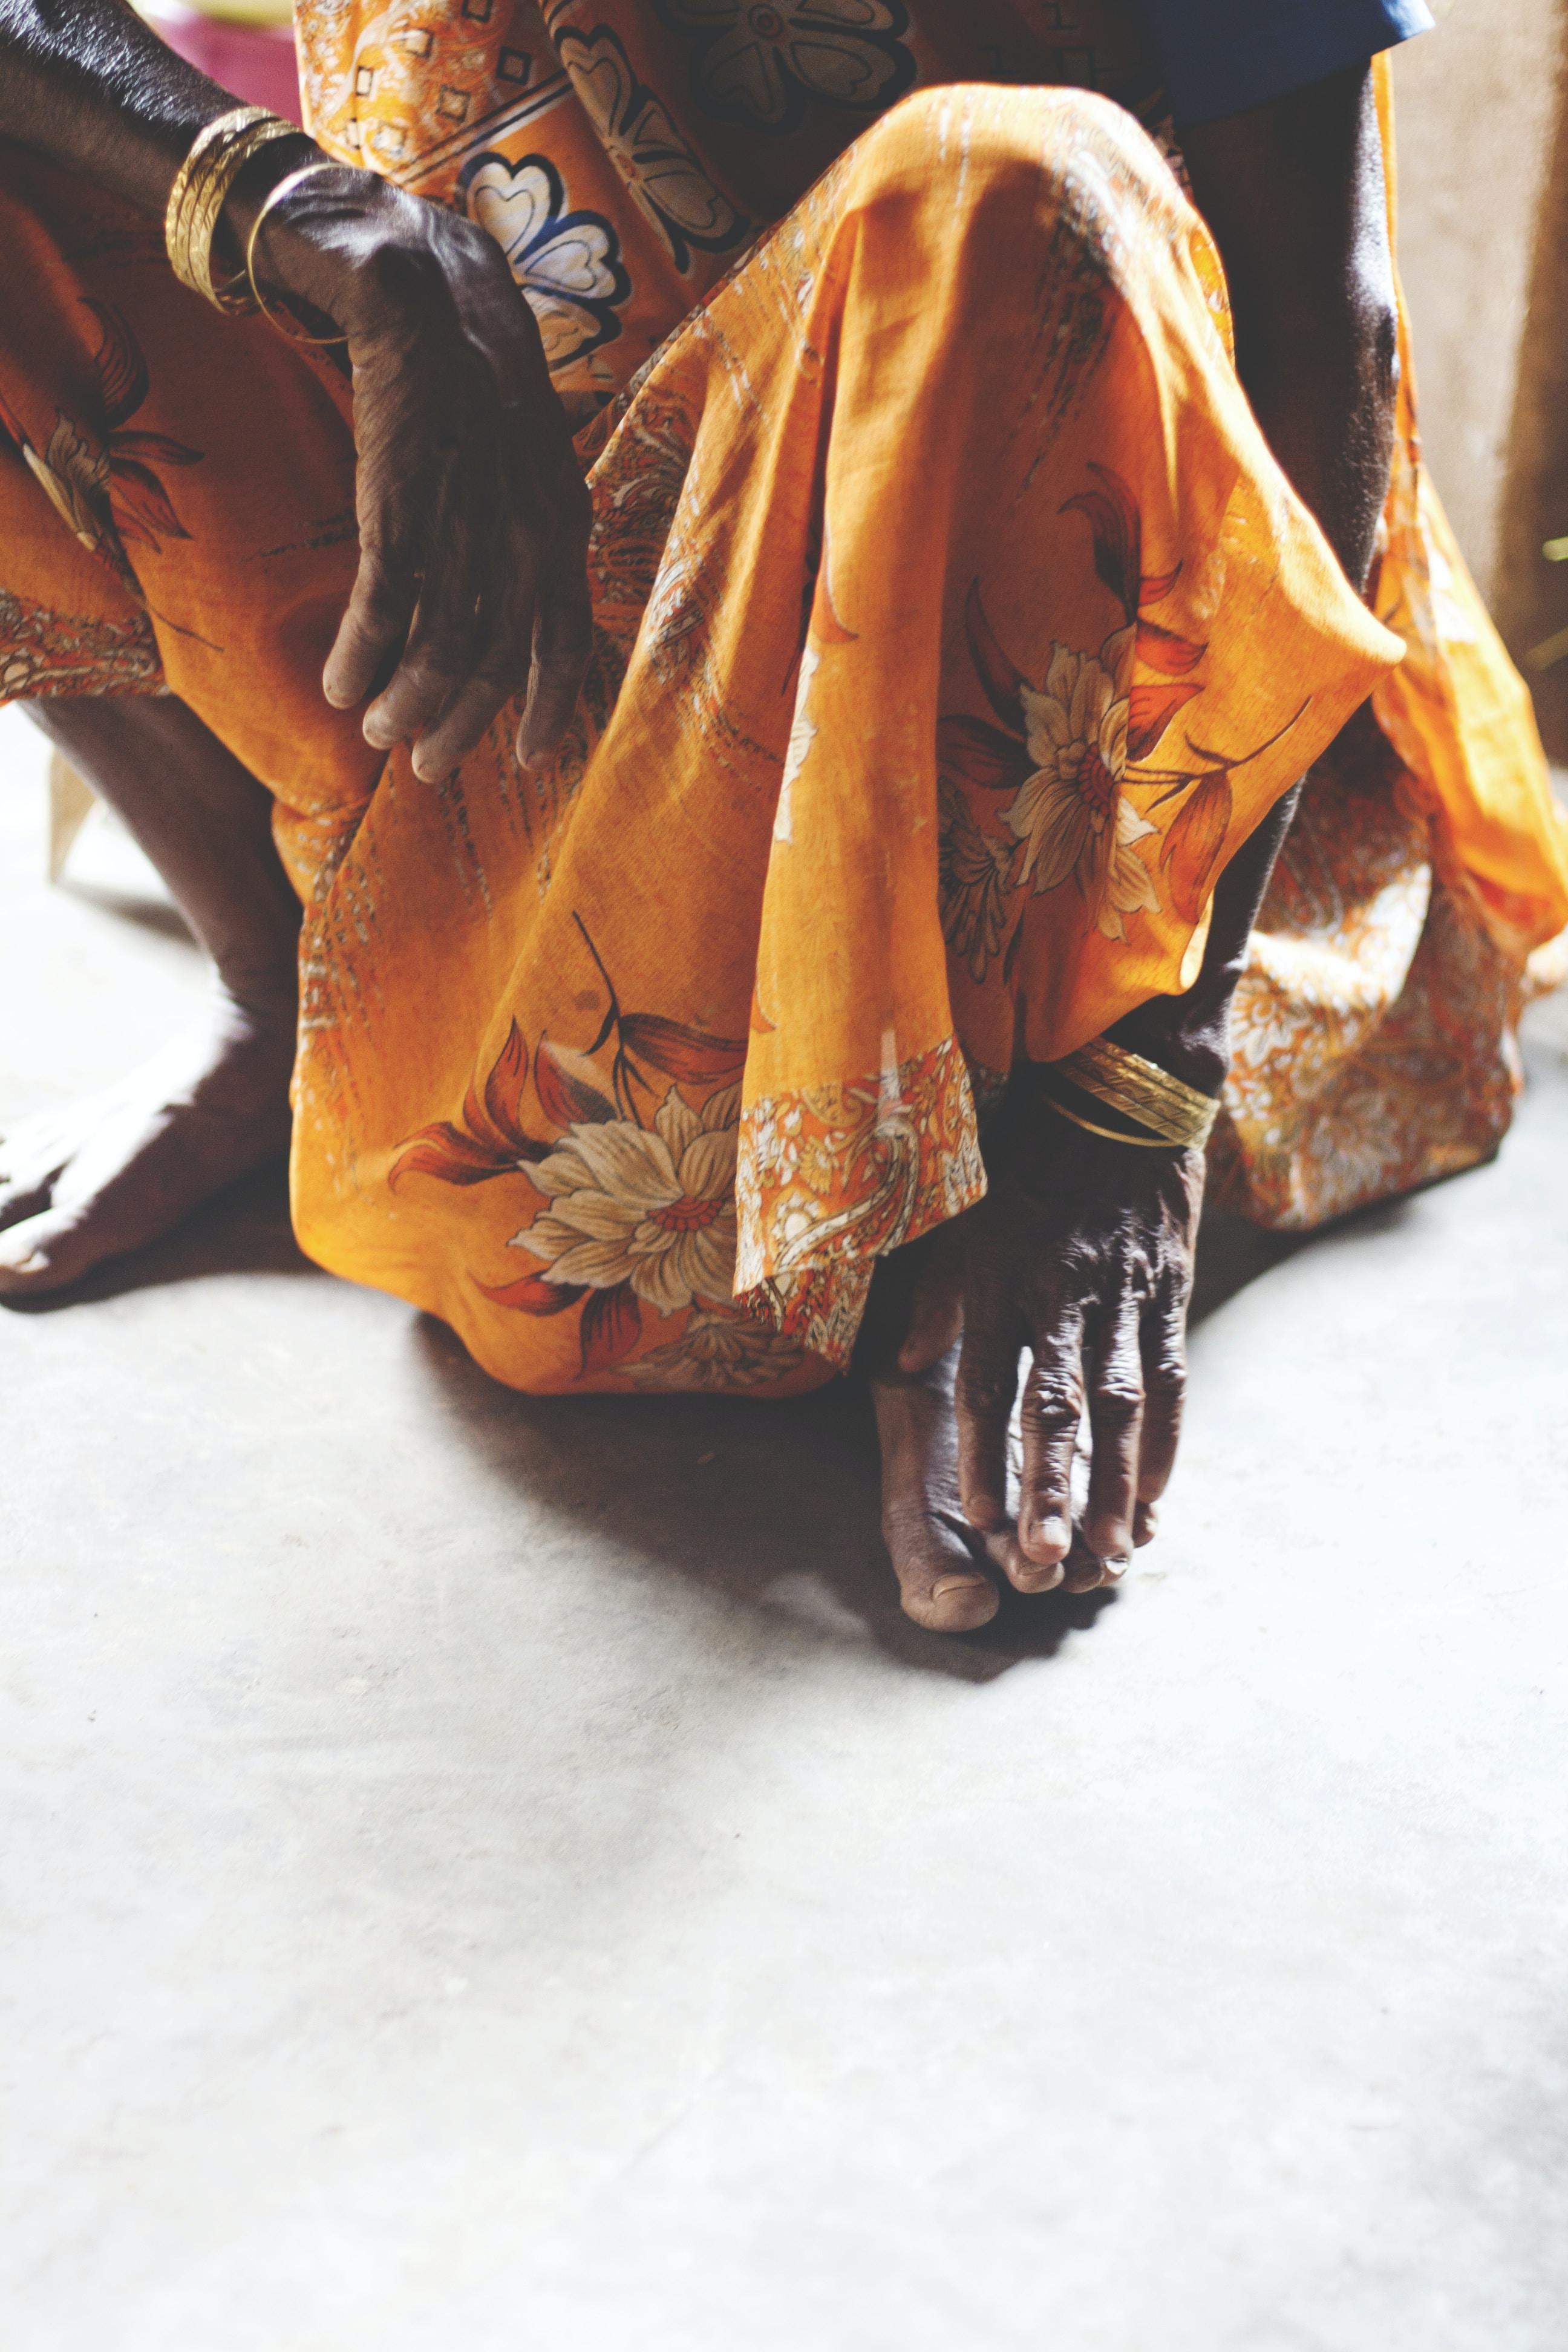 woman squatting on floor